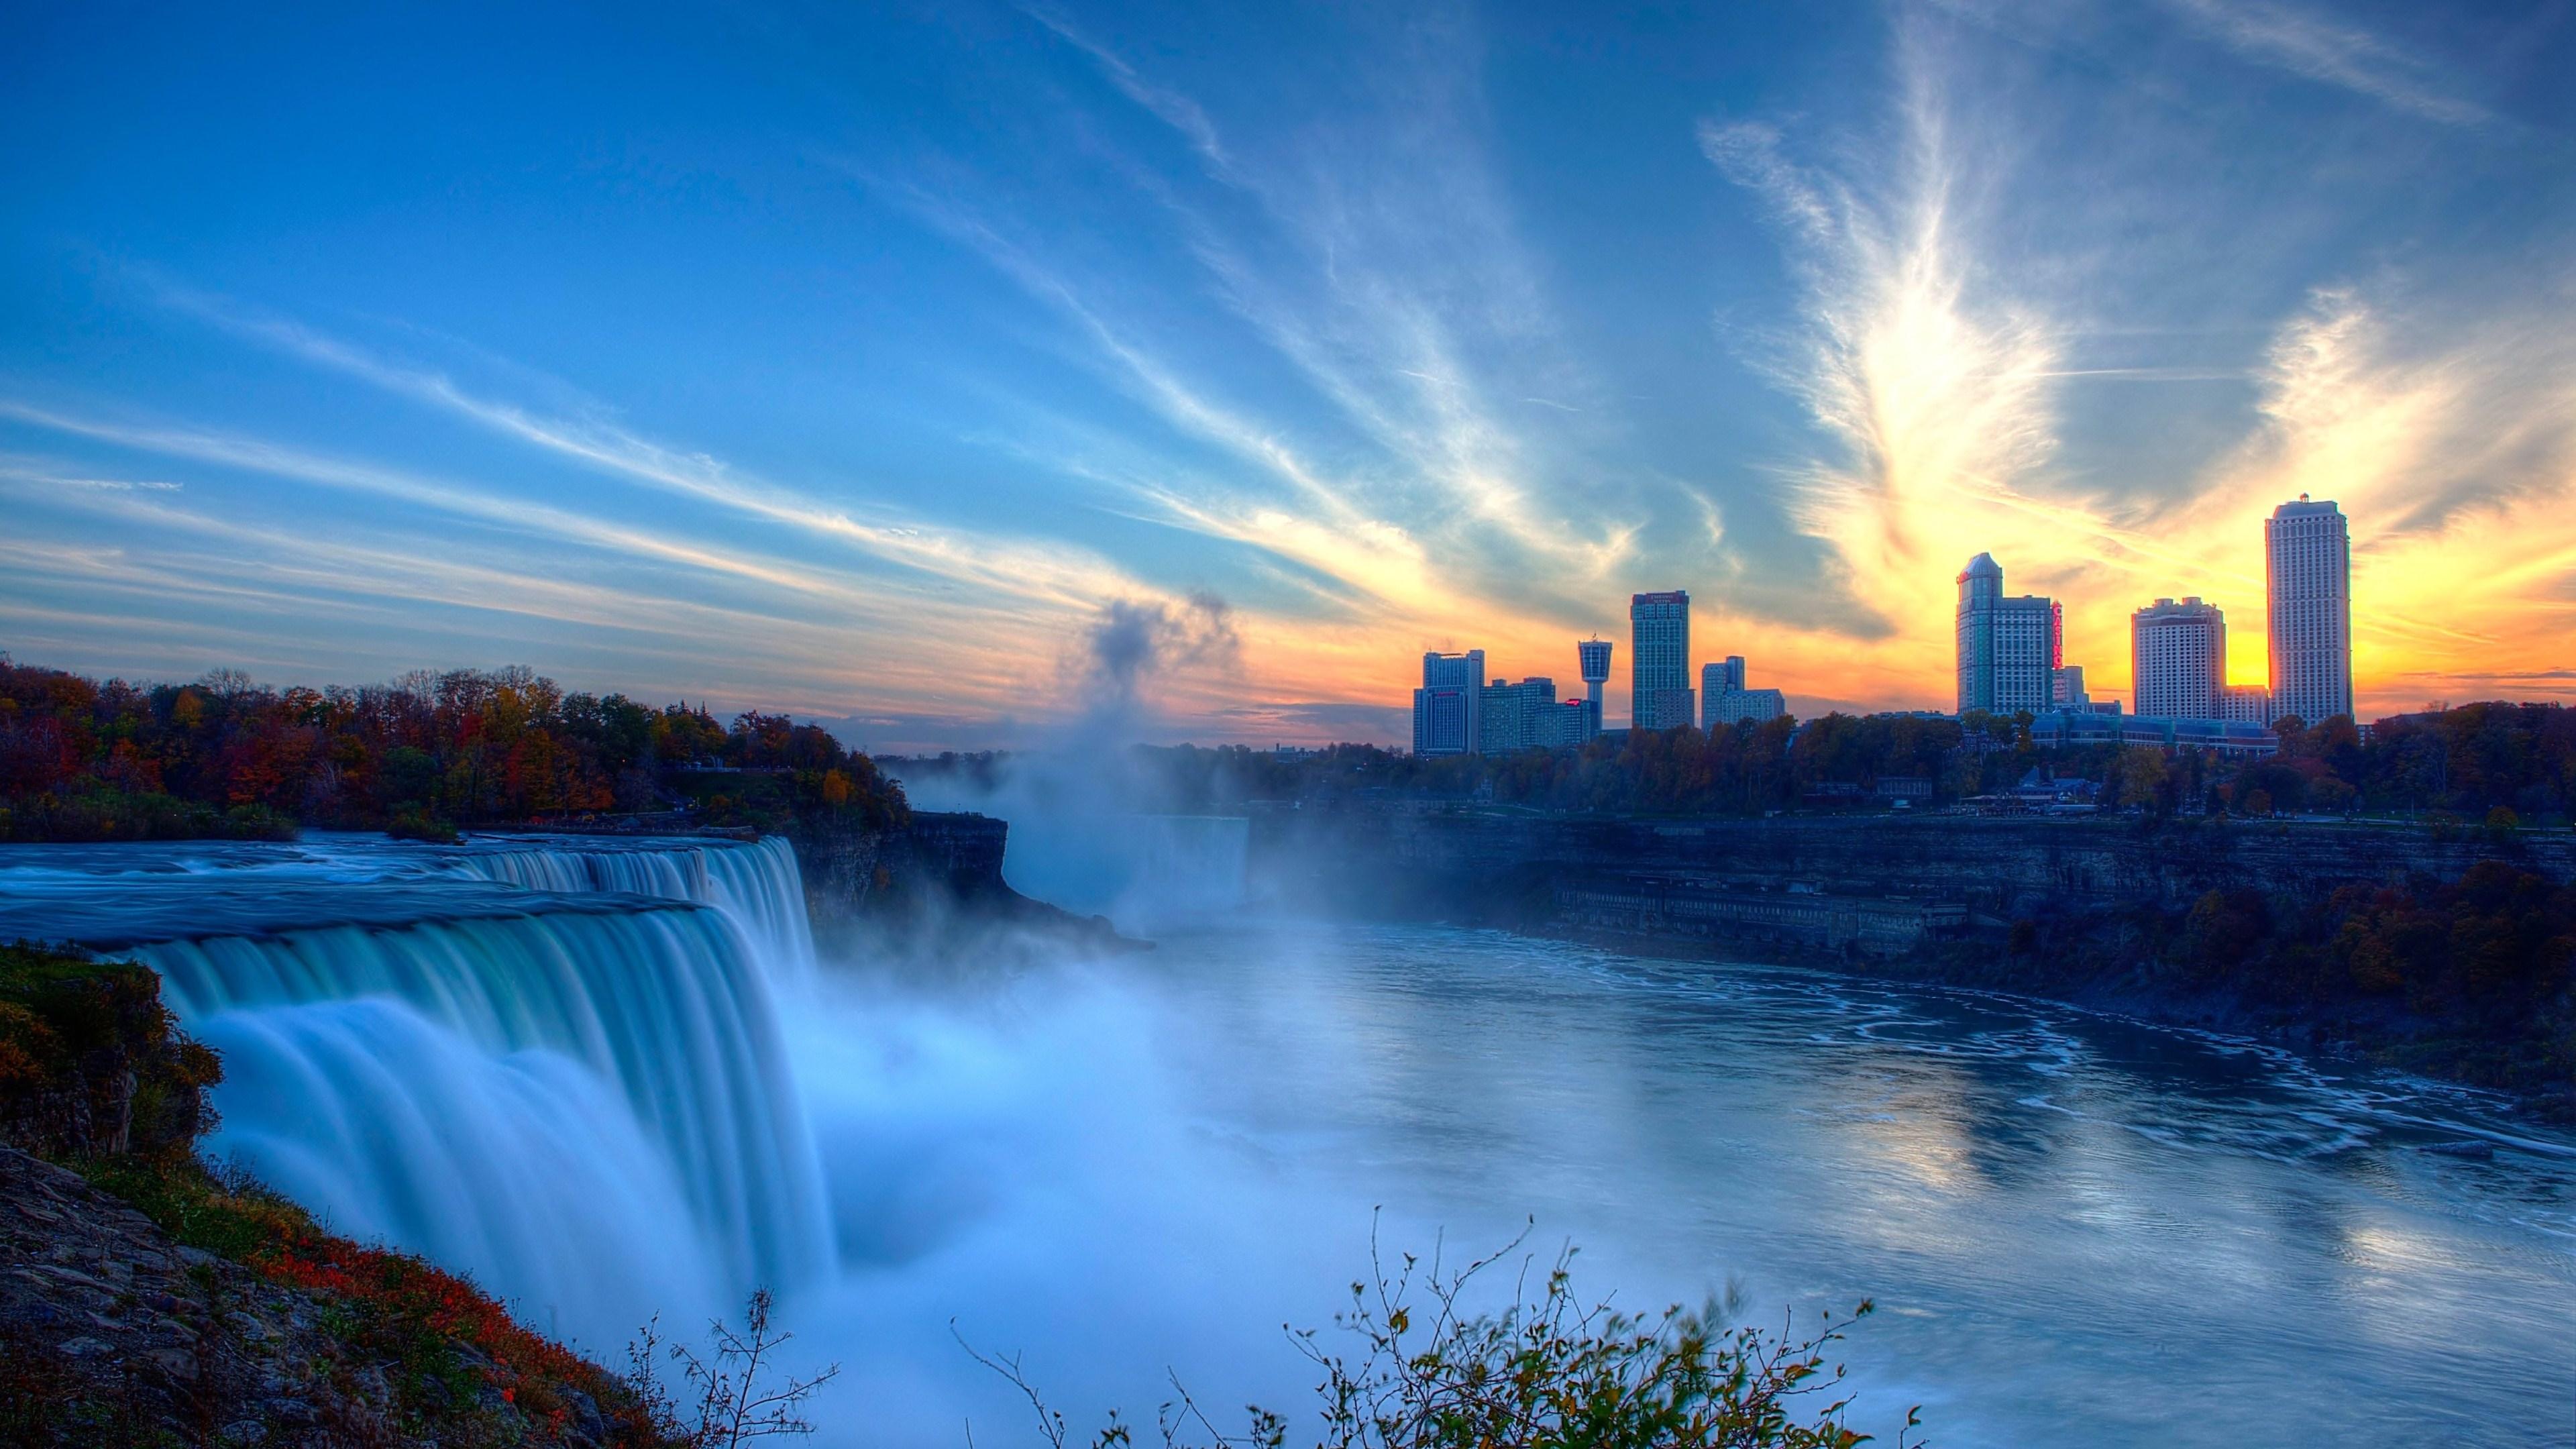 Sunset Niagara Falls Wallpaper